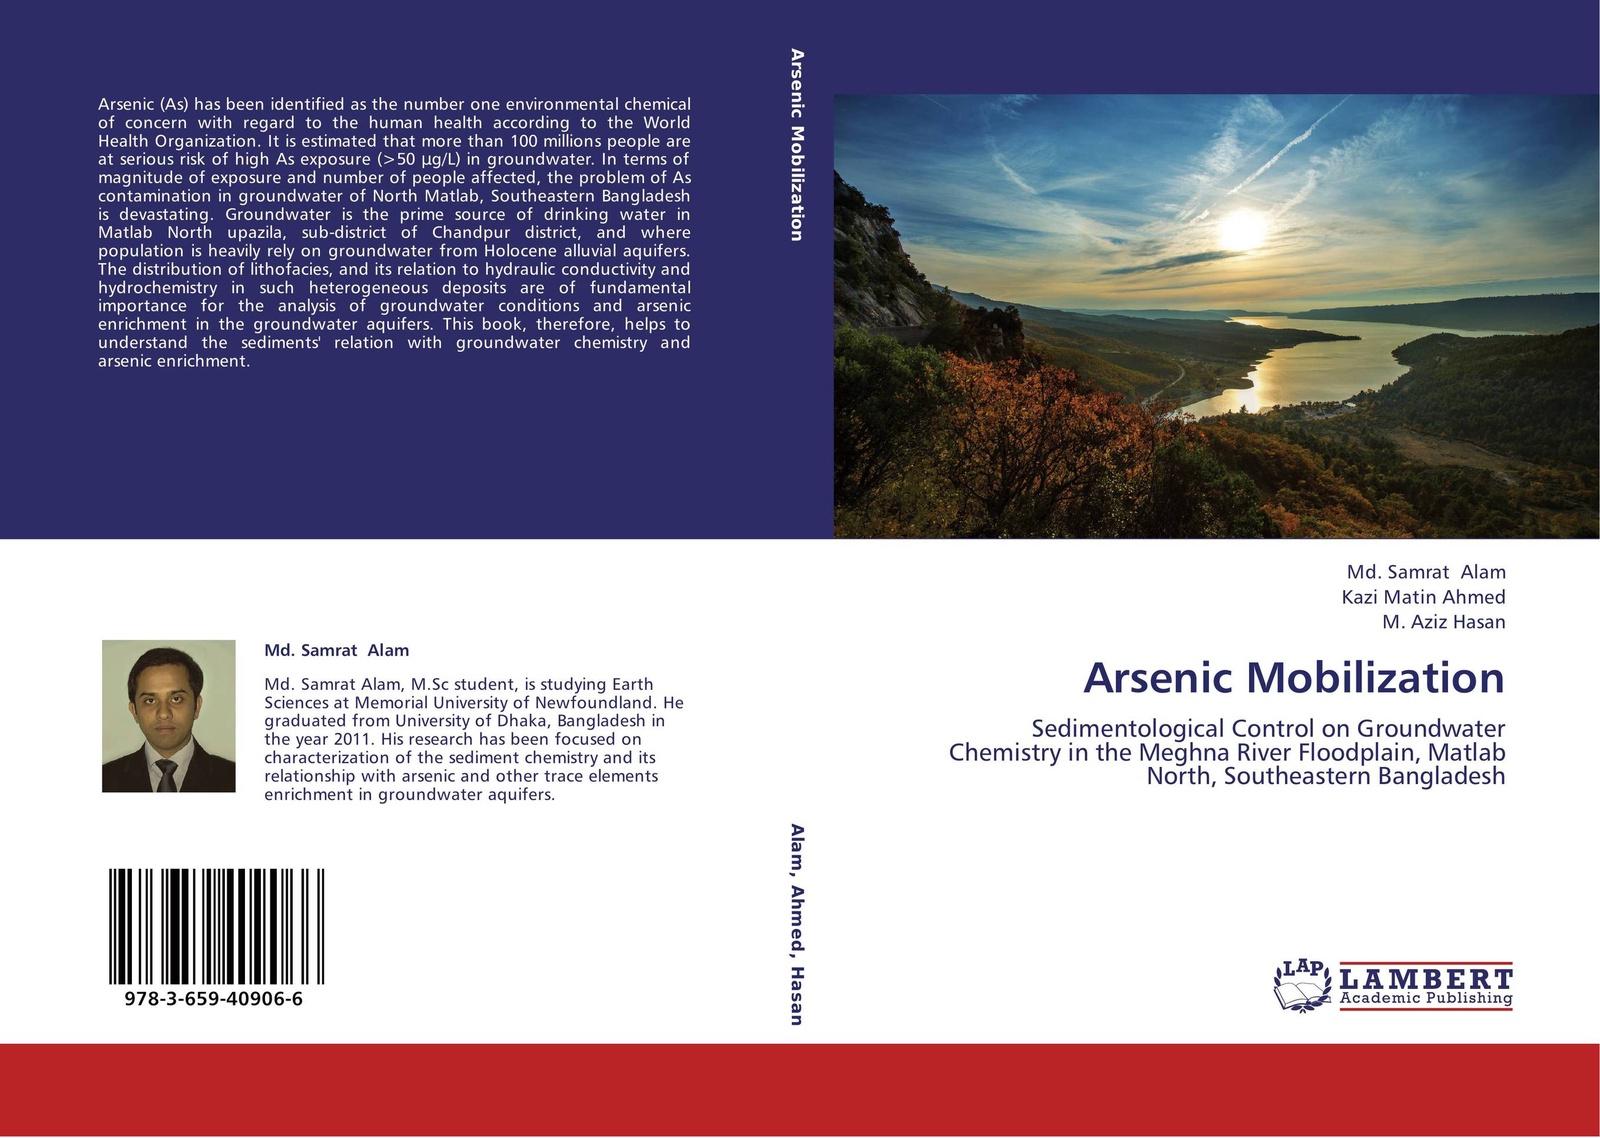 Md. Samrat Alam,Kazi Matin Ahmed and M. Aziz Hasan Arsenic Mobilization j states christopher arsenic exposure sources health risks and mechanisms of toxicity